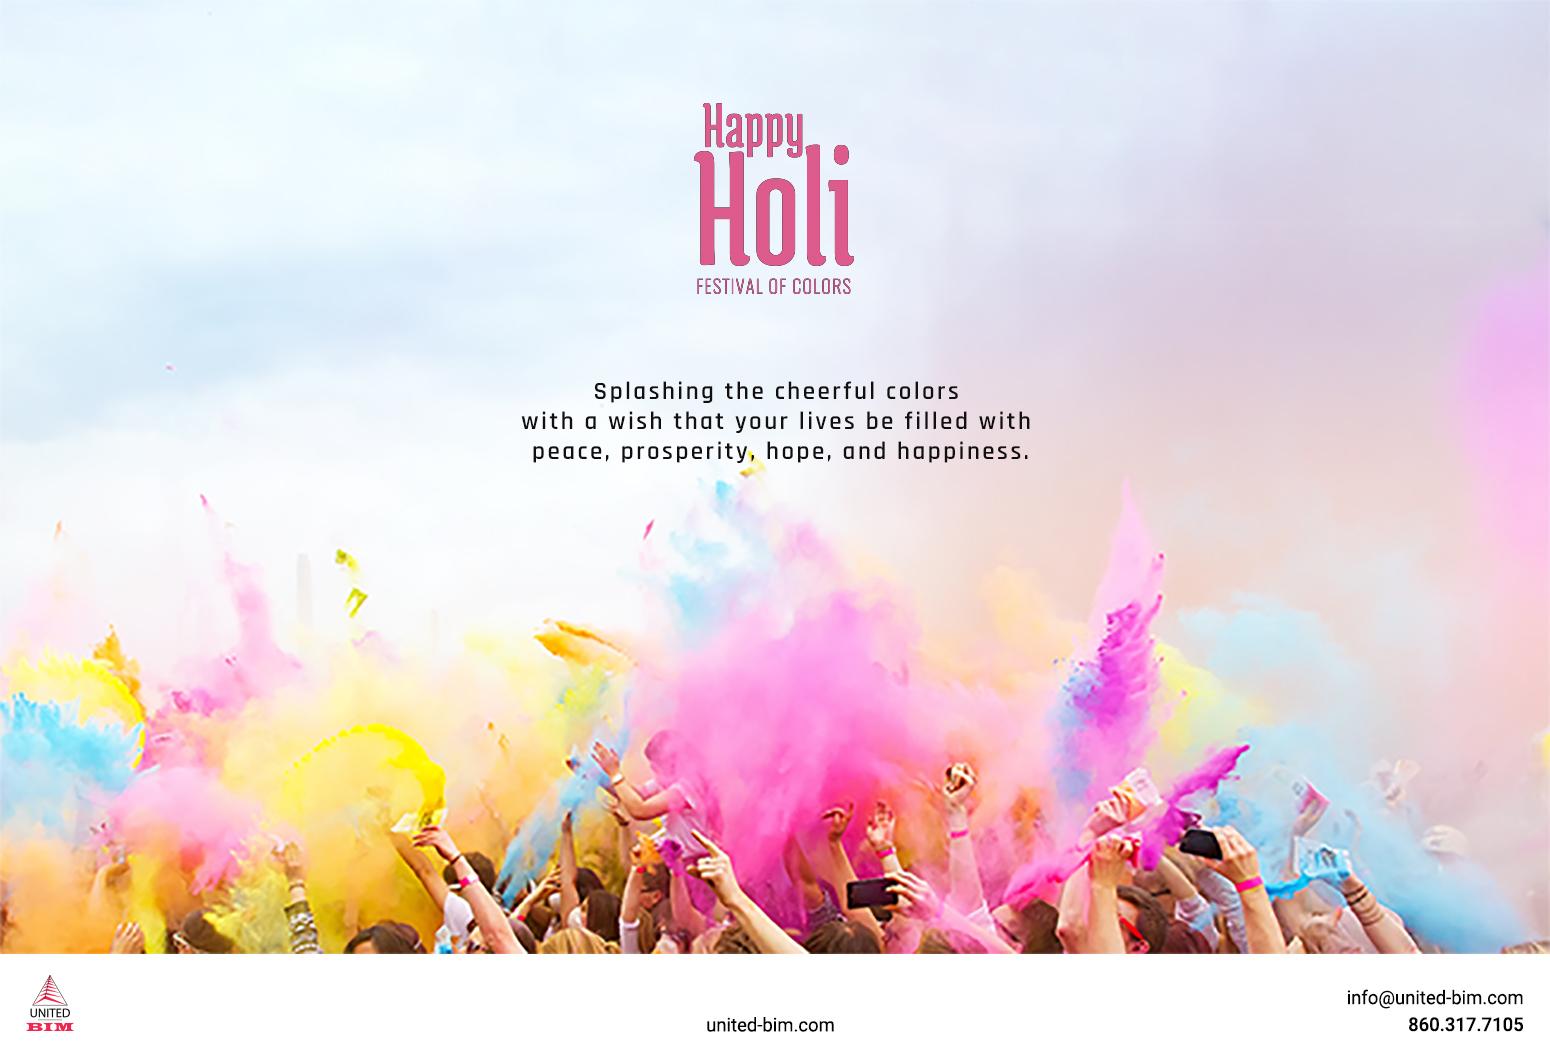 Happy Holi 2021 Graphic by United-BIM